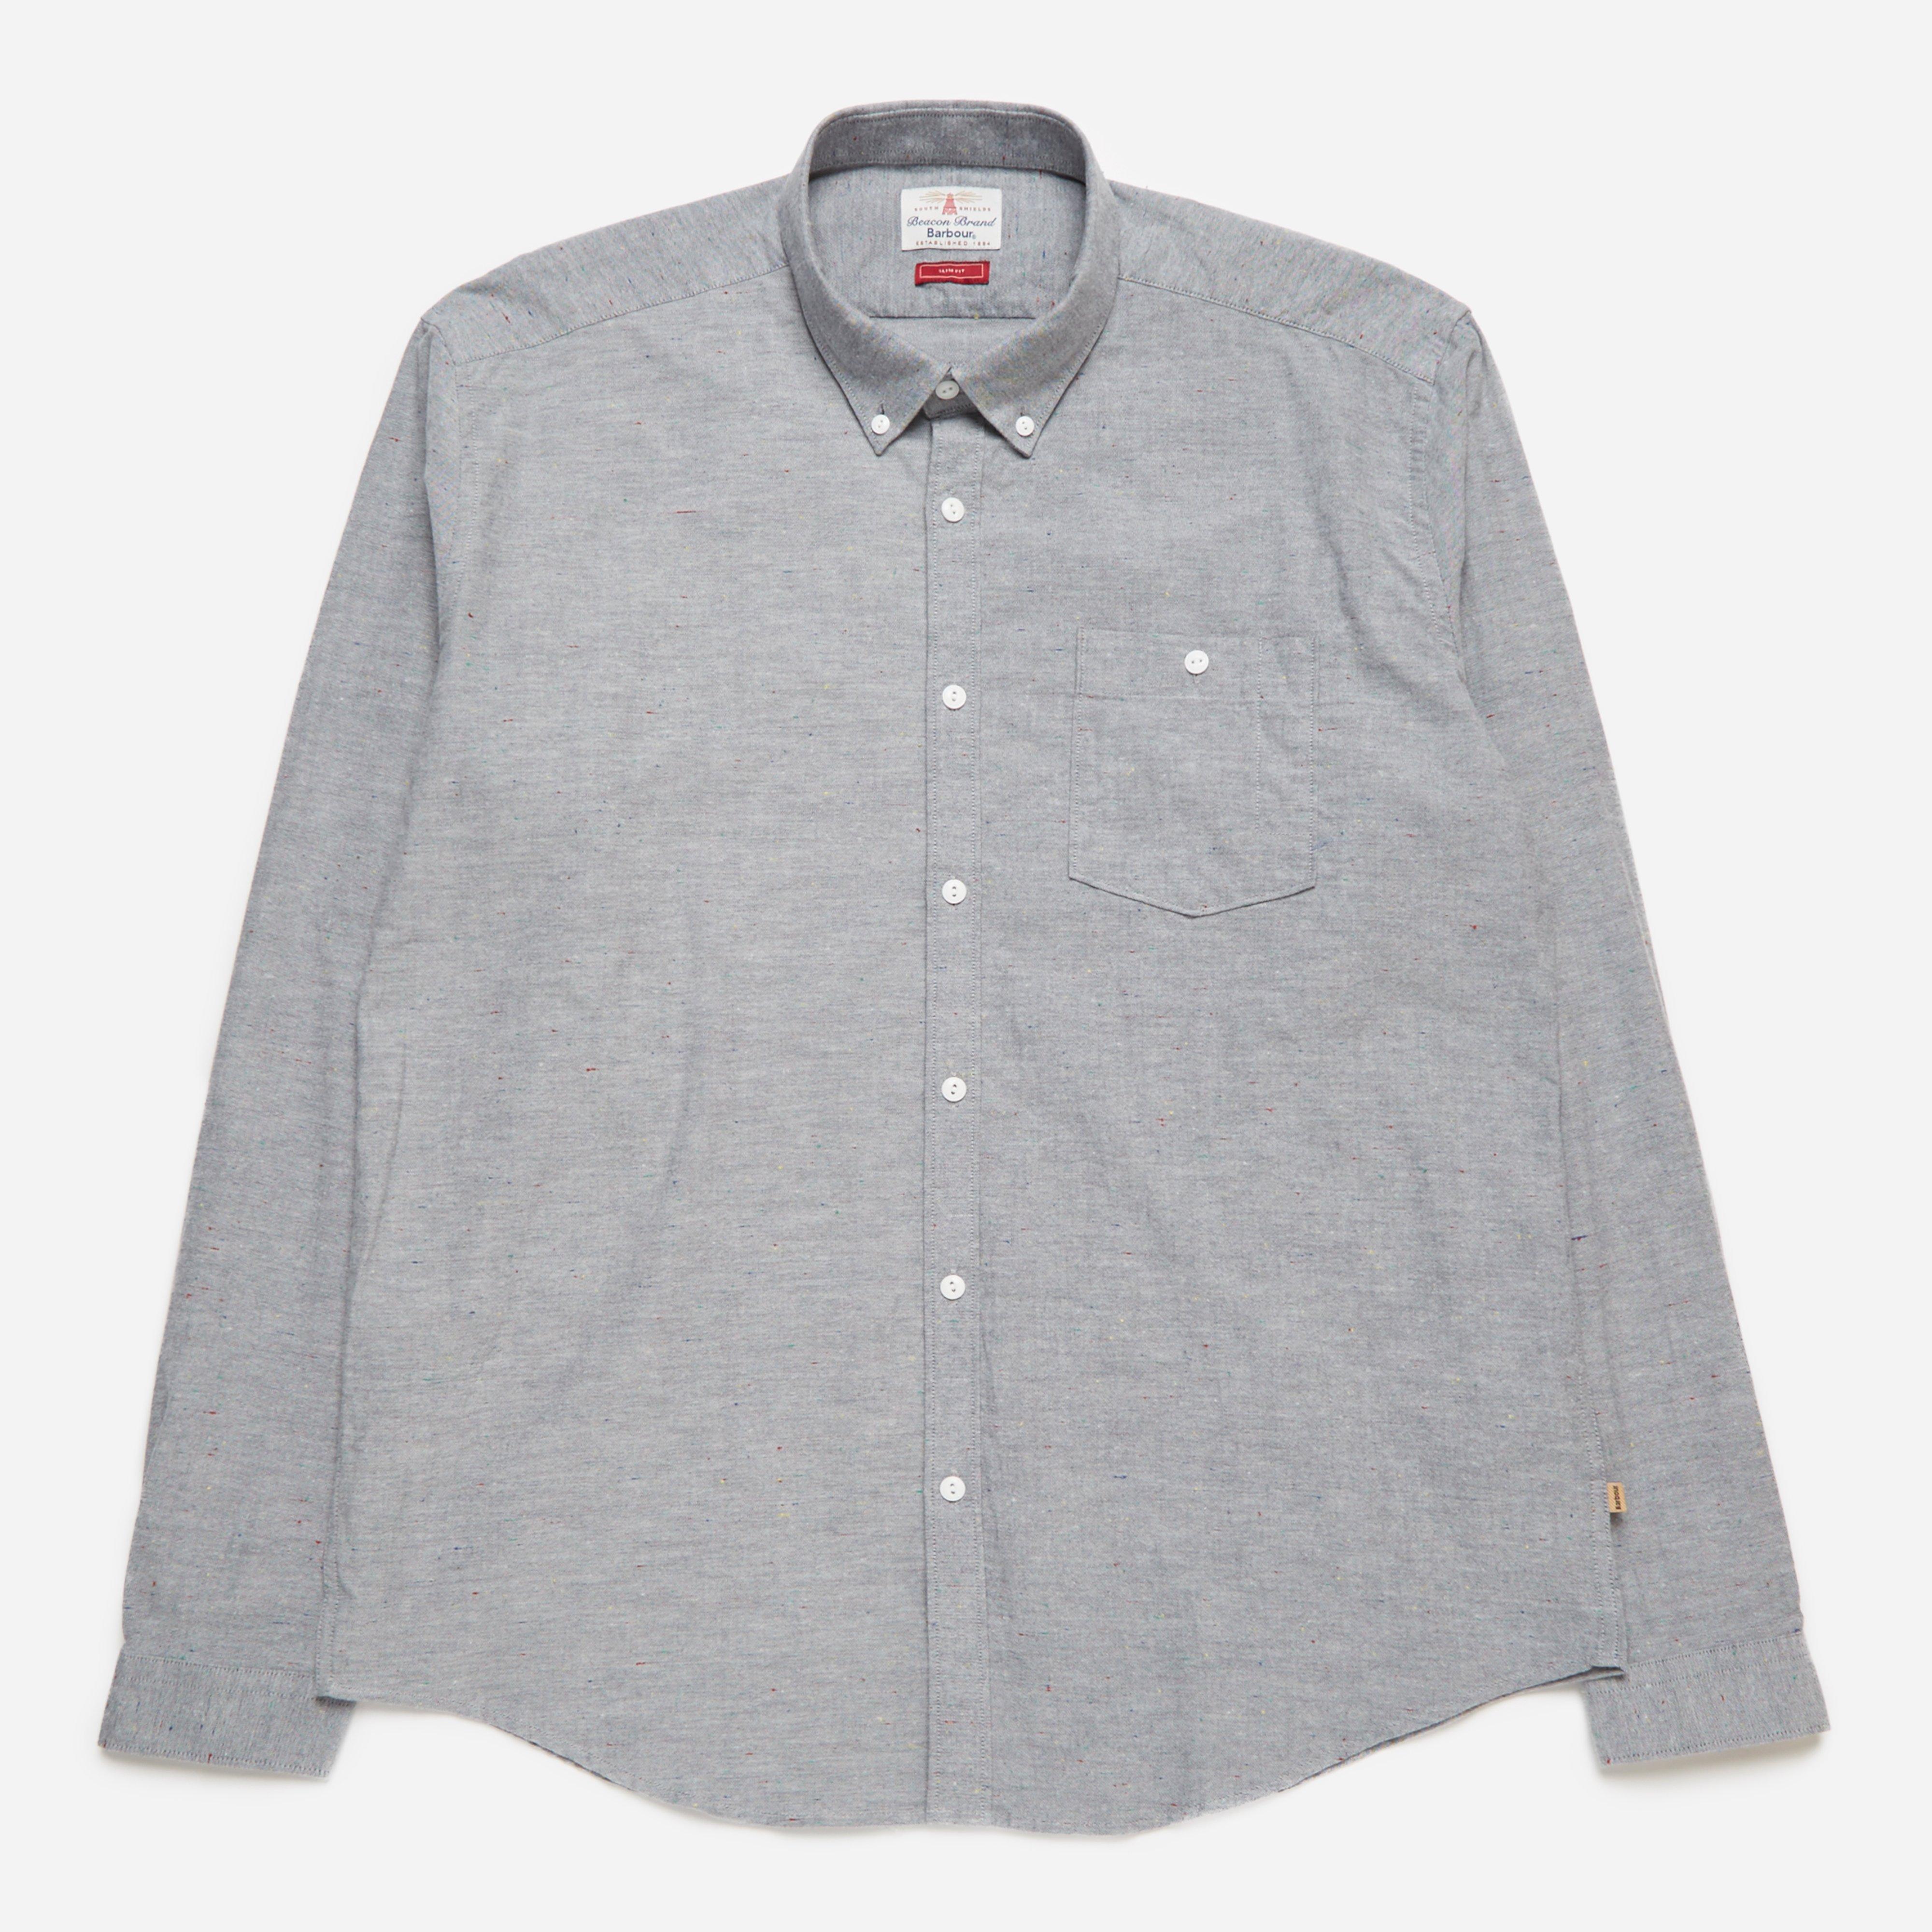 Barbour Carew Oxford Shirt